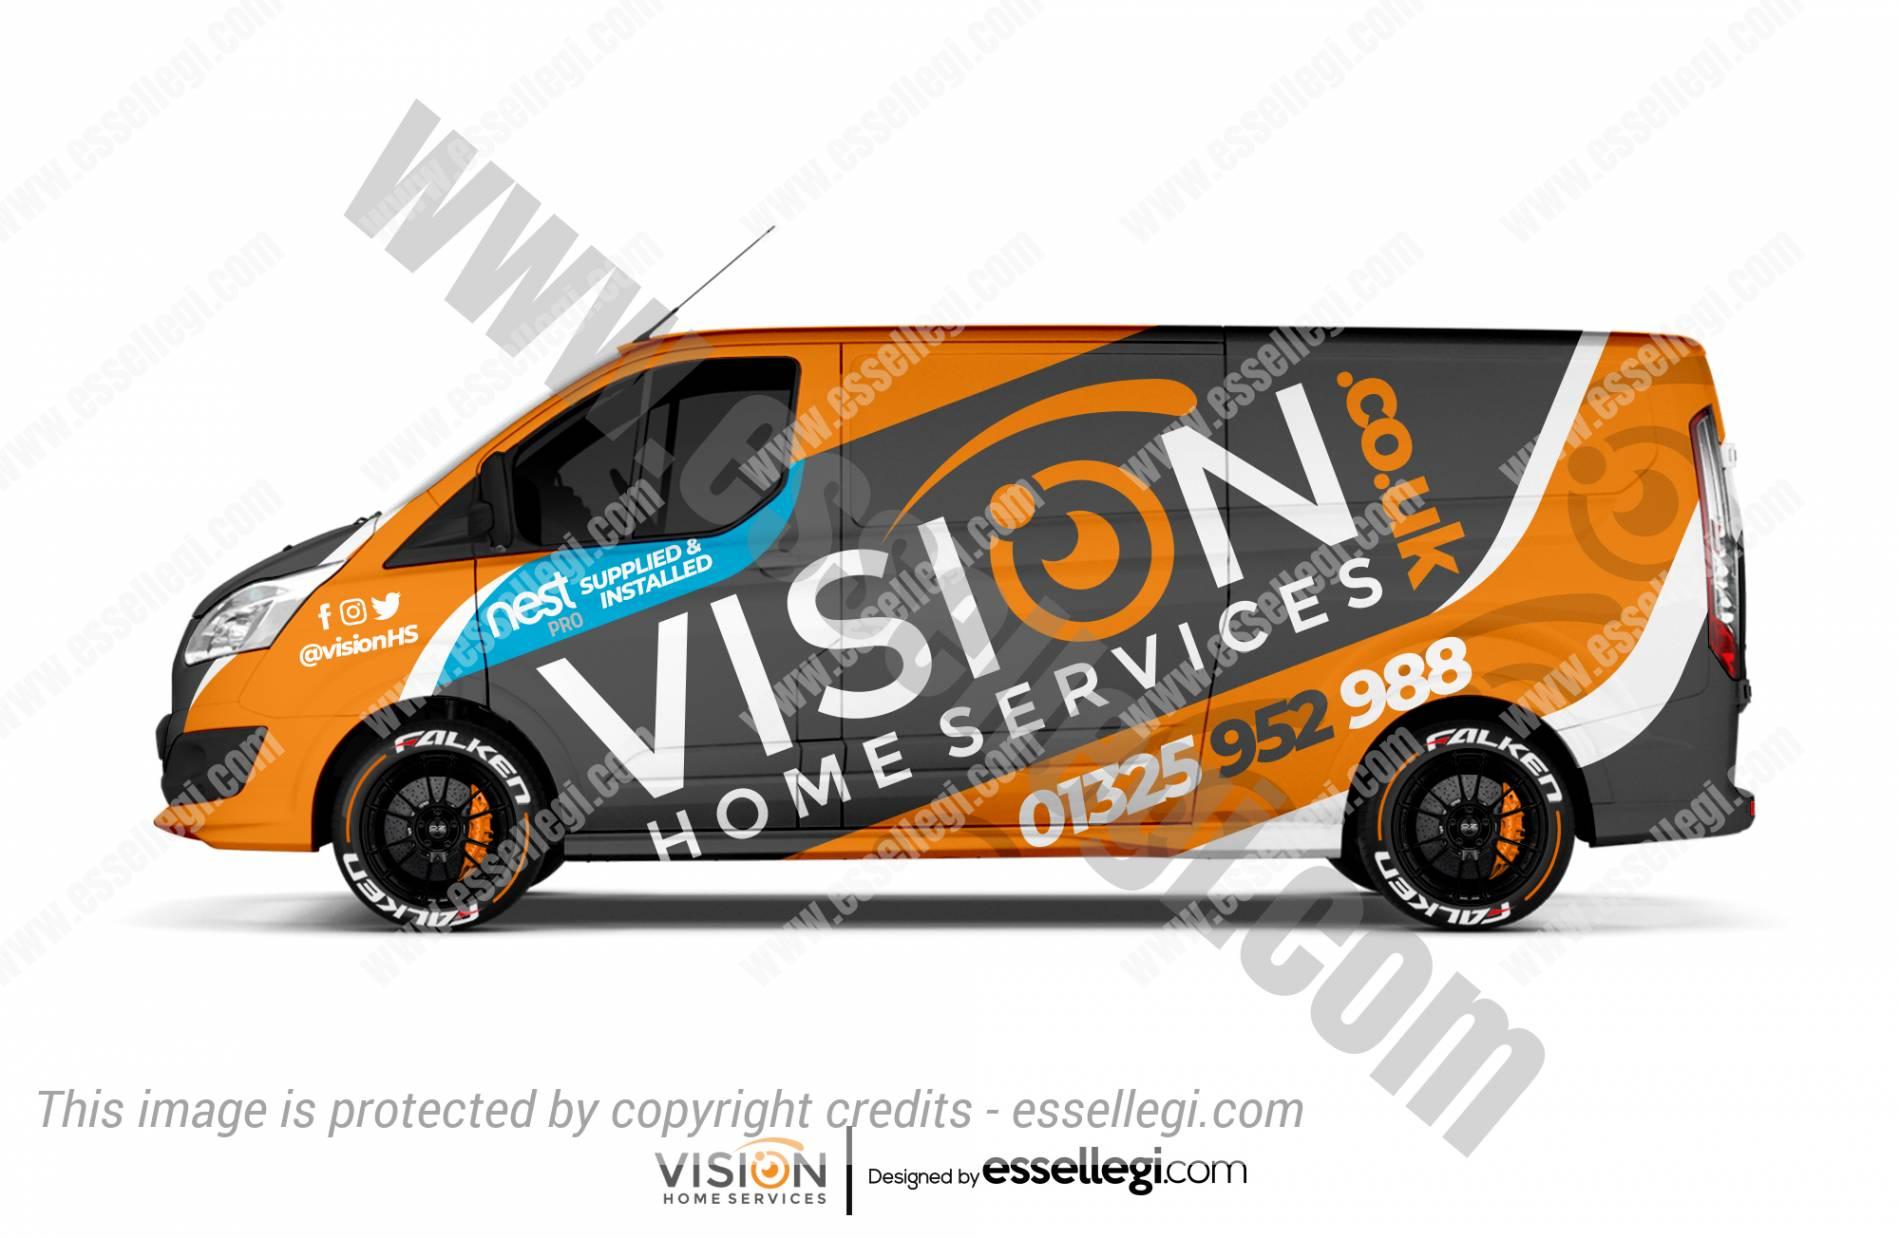 Ford Transit Custom Wrap Design. Ford Transit Custom | Van Wrap Design by Essellegi. Van Signs, Van Signage, Van Wrapping, Van Signwriting, Van Wrap Designer, Signs for Van, Van Logo, Van Graphic by Essellegi.